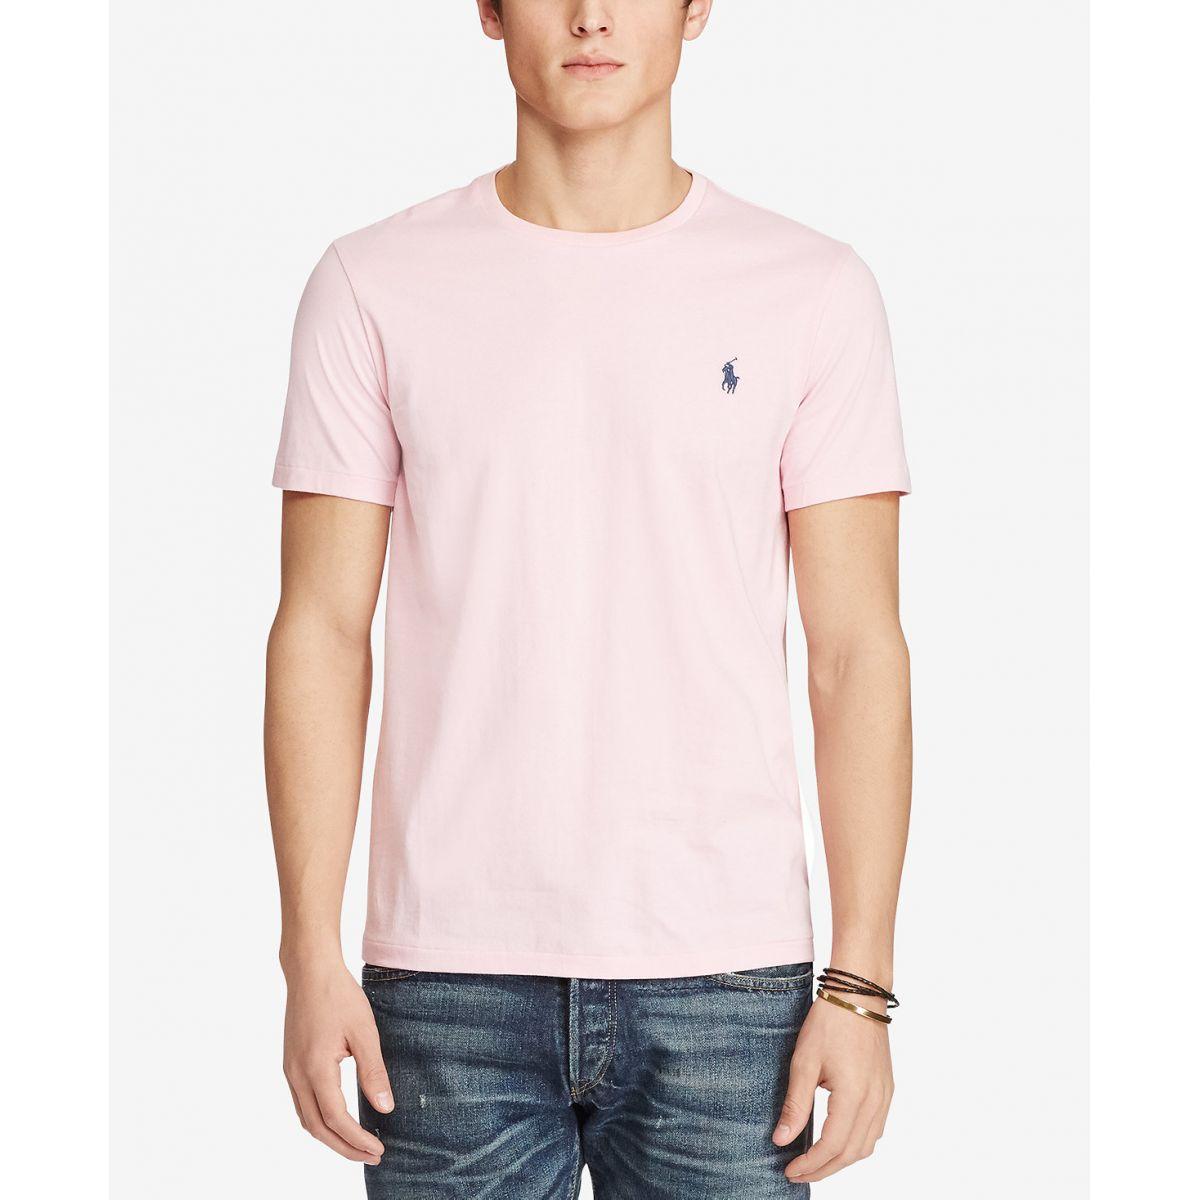 Camiseta Basic Ralph Lauren Rosa  - Ca Brasileira